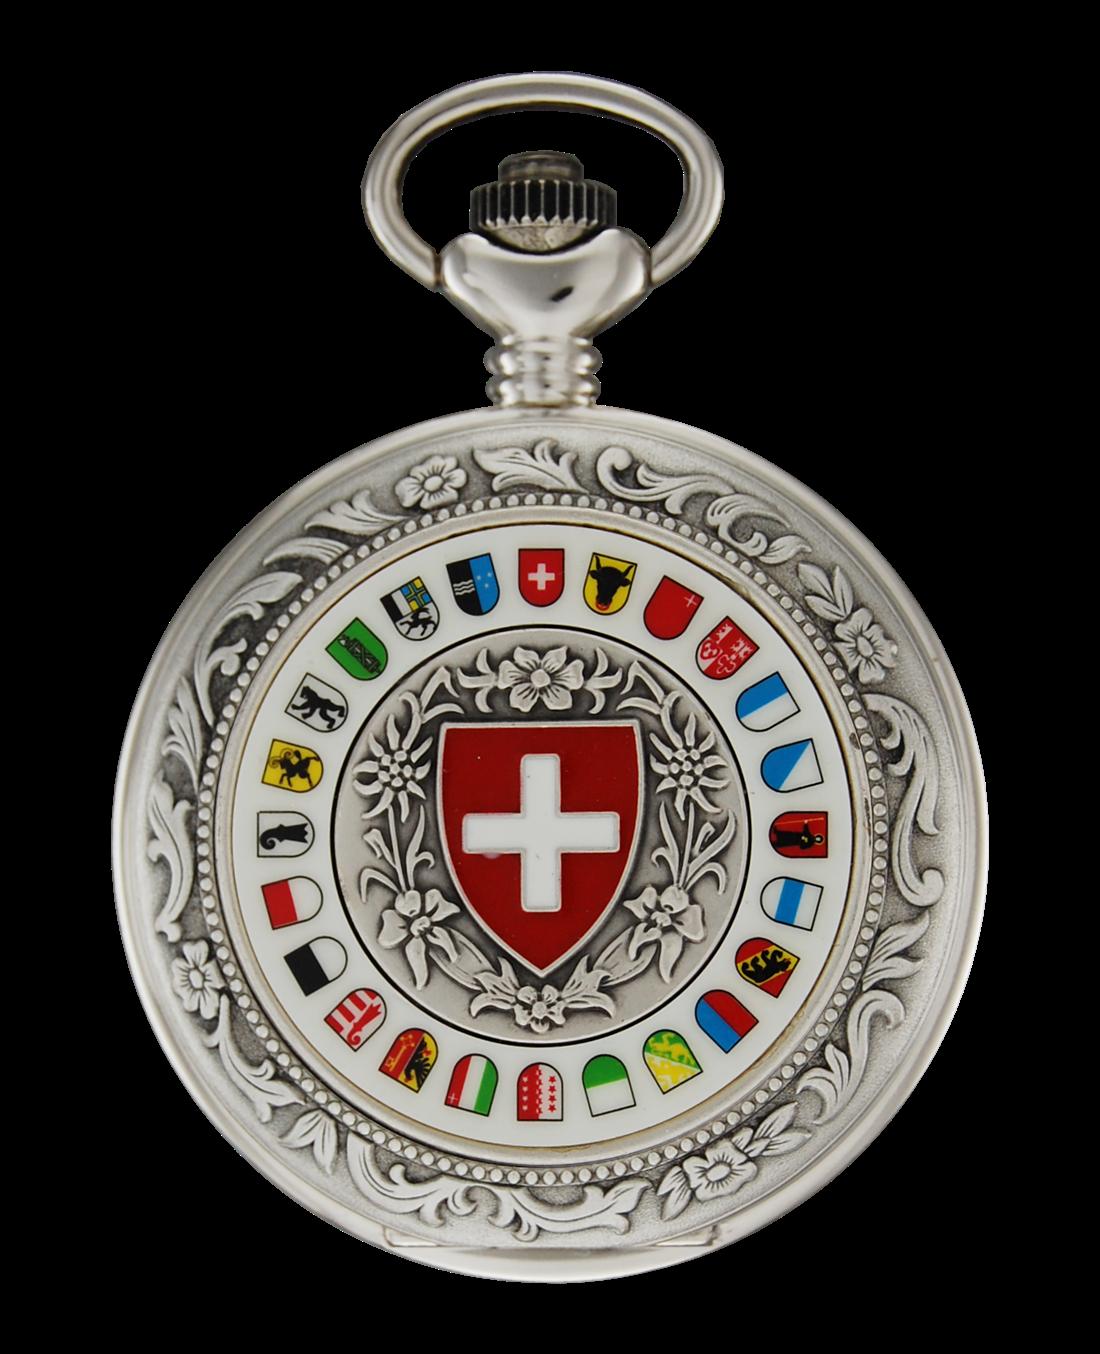 Jacques Du Manoir Pocket Watch Boegli Watches Amp Clocks